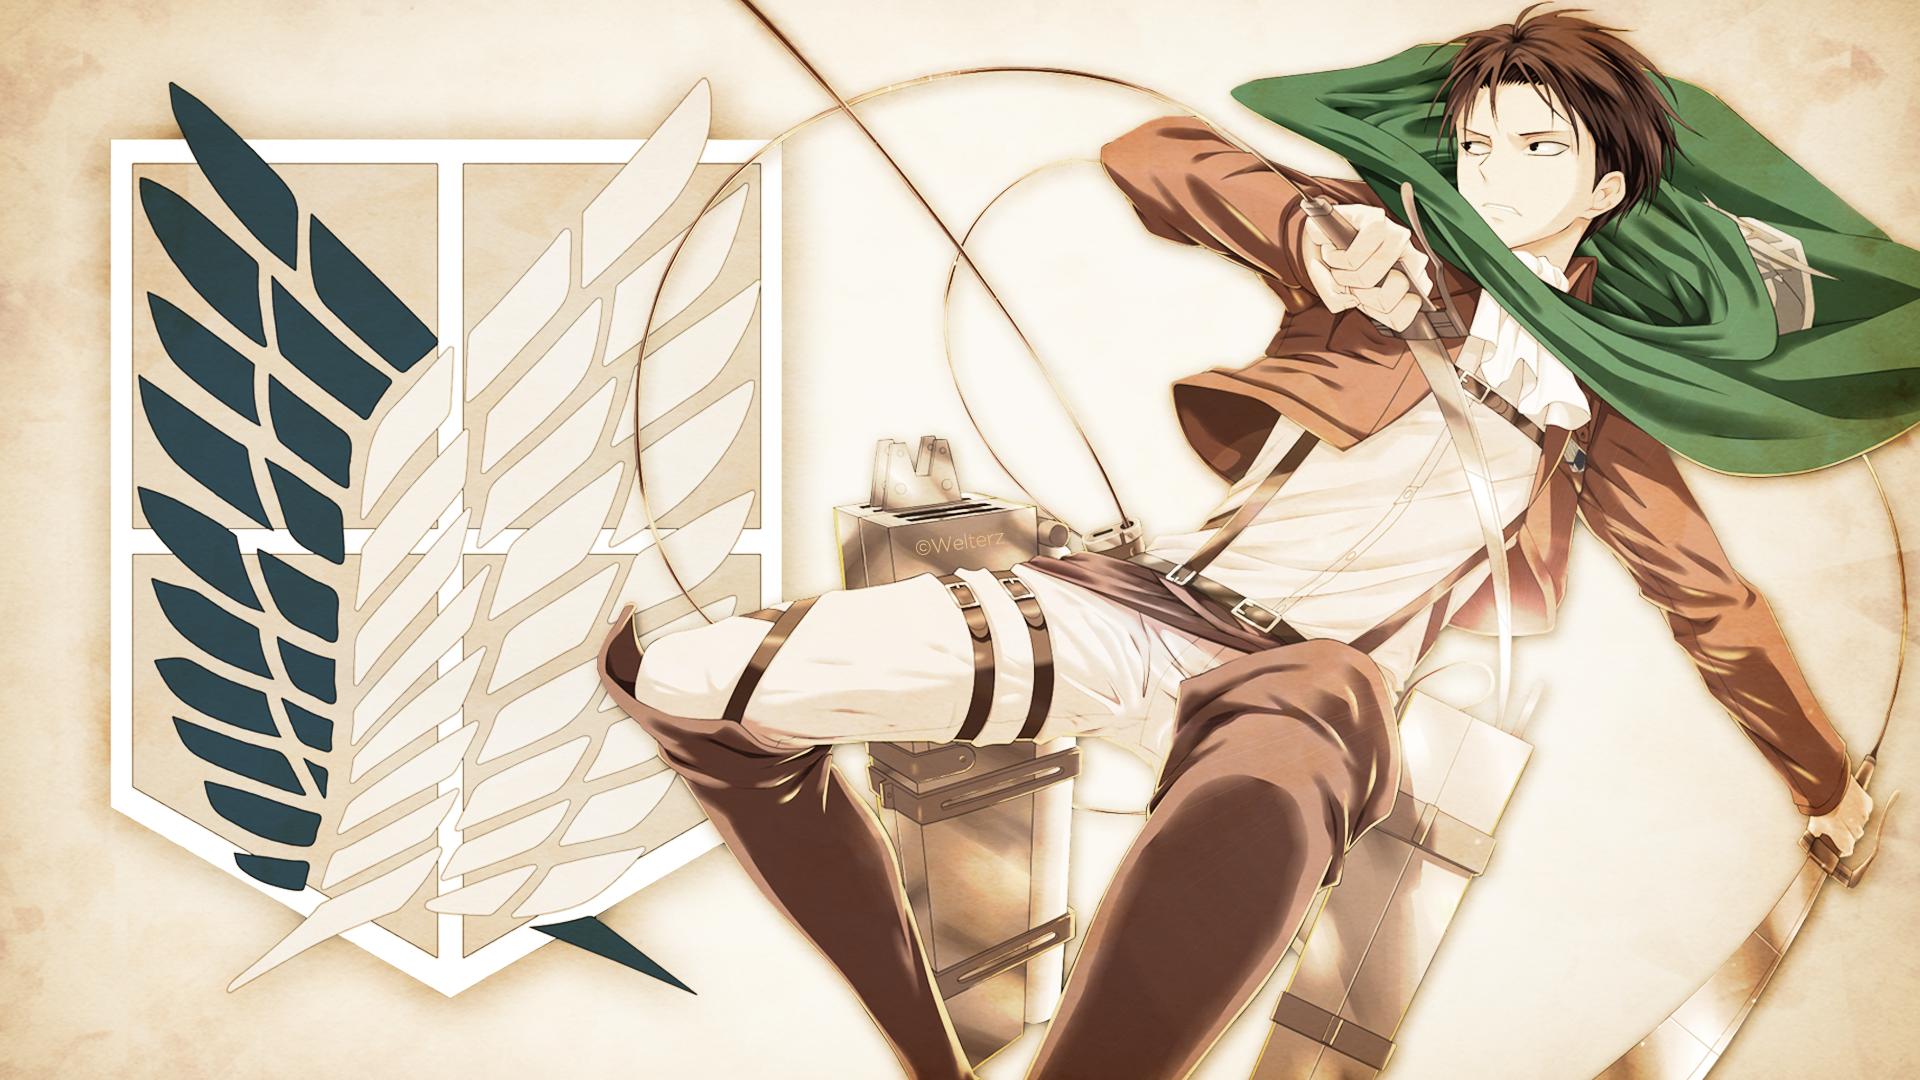 Shingeki No Kyonjin Captain Levi Computer Wallpapers Desktop Backgrounds 1920x1080 Id 60770 Attack On Titan Attack On Titan Fanart Attack On Titan Anime